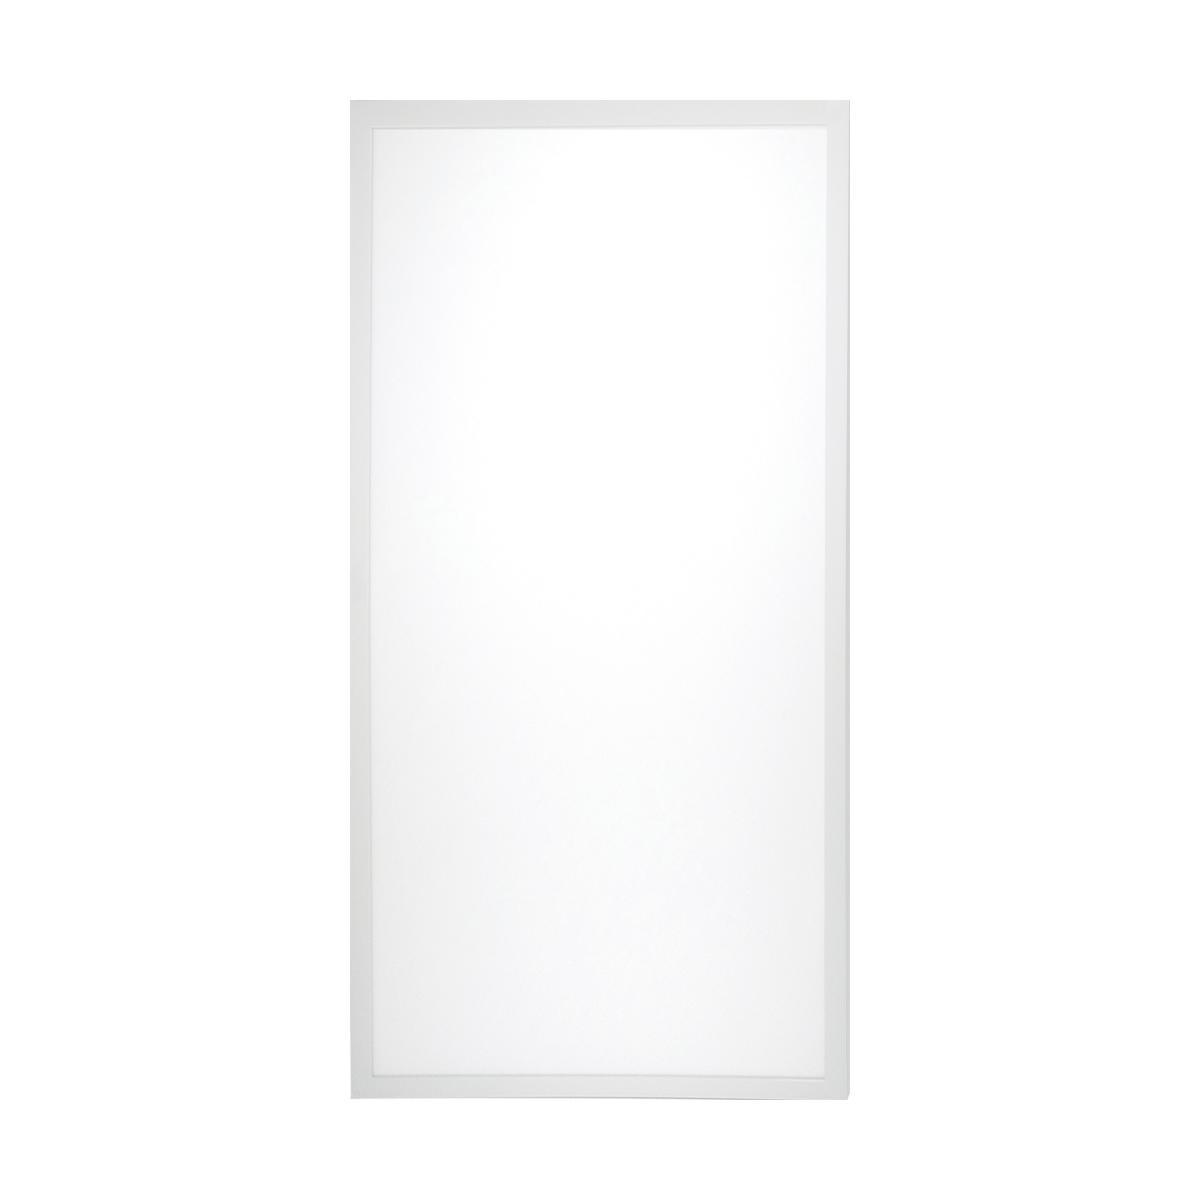 65-586 2X4 LED EM BACKLIT FLAT PANEL